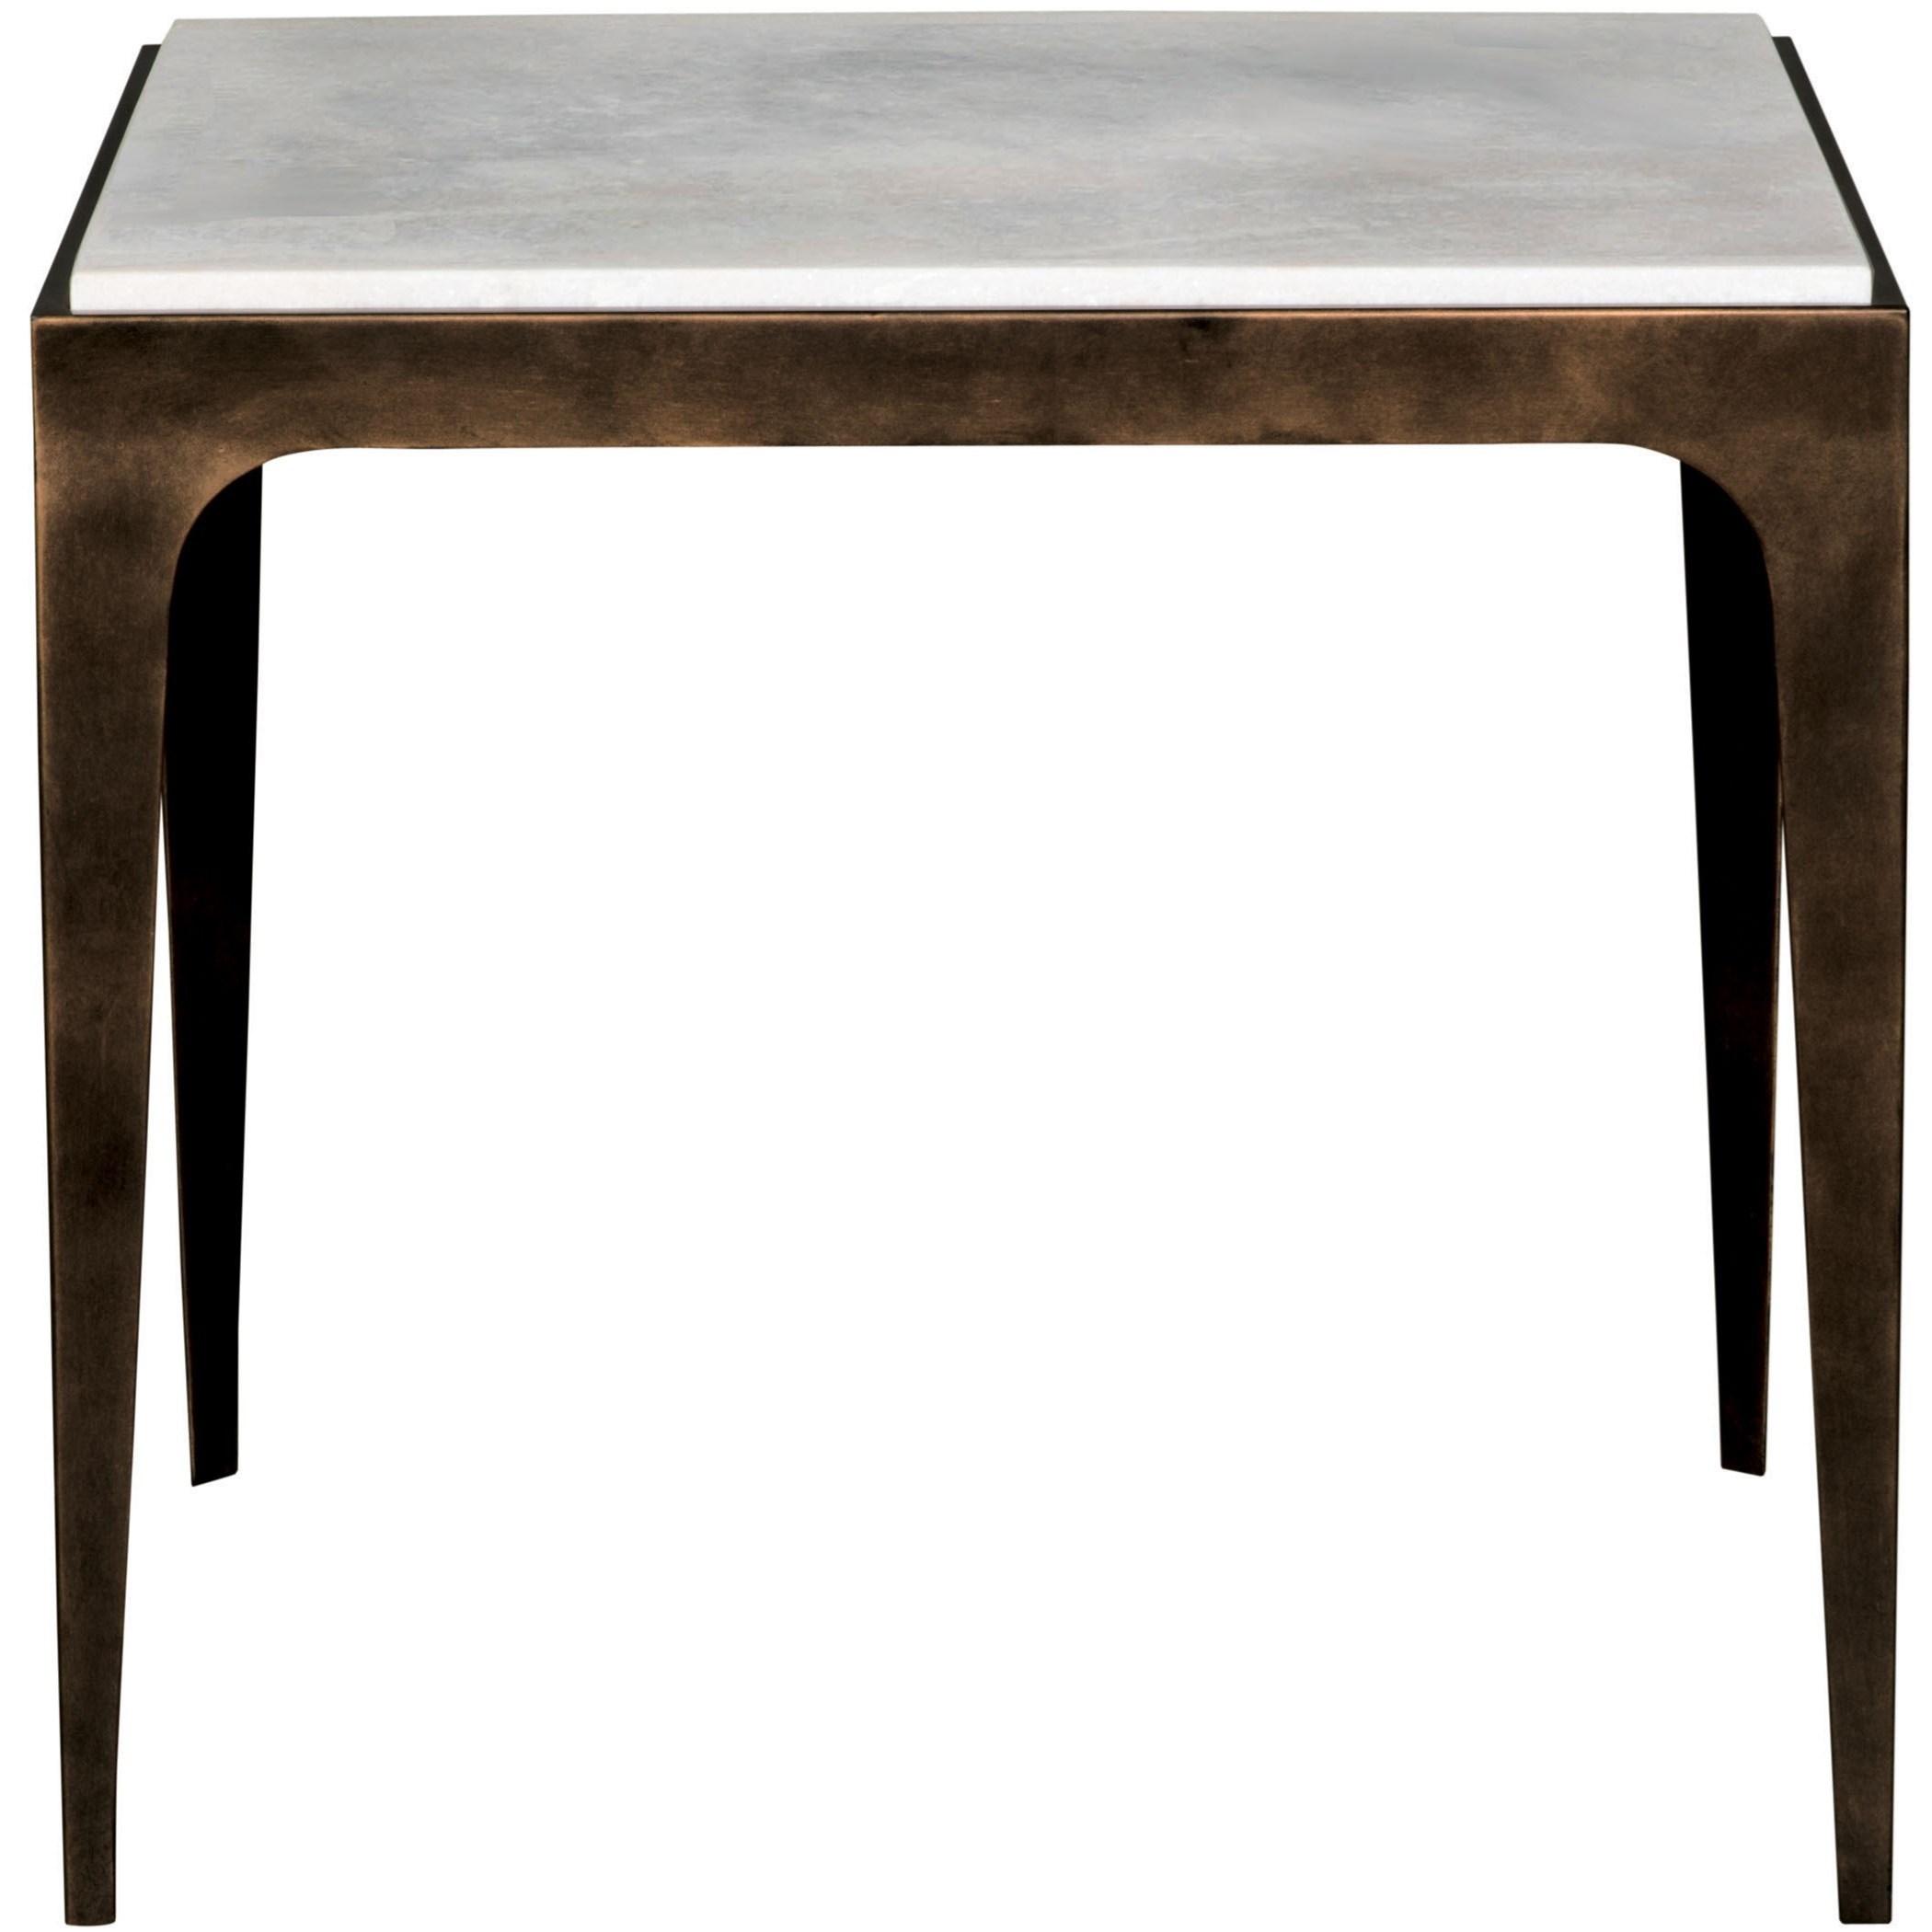 Hancock Rectangular End Table by Vanguard Furniture at Baer's Furniture